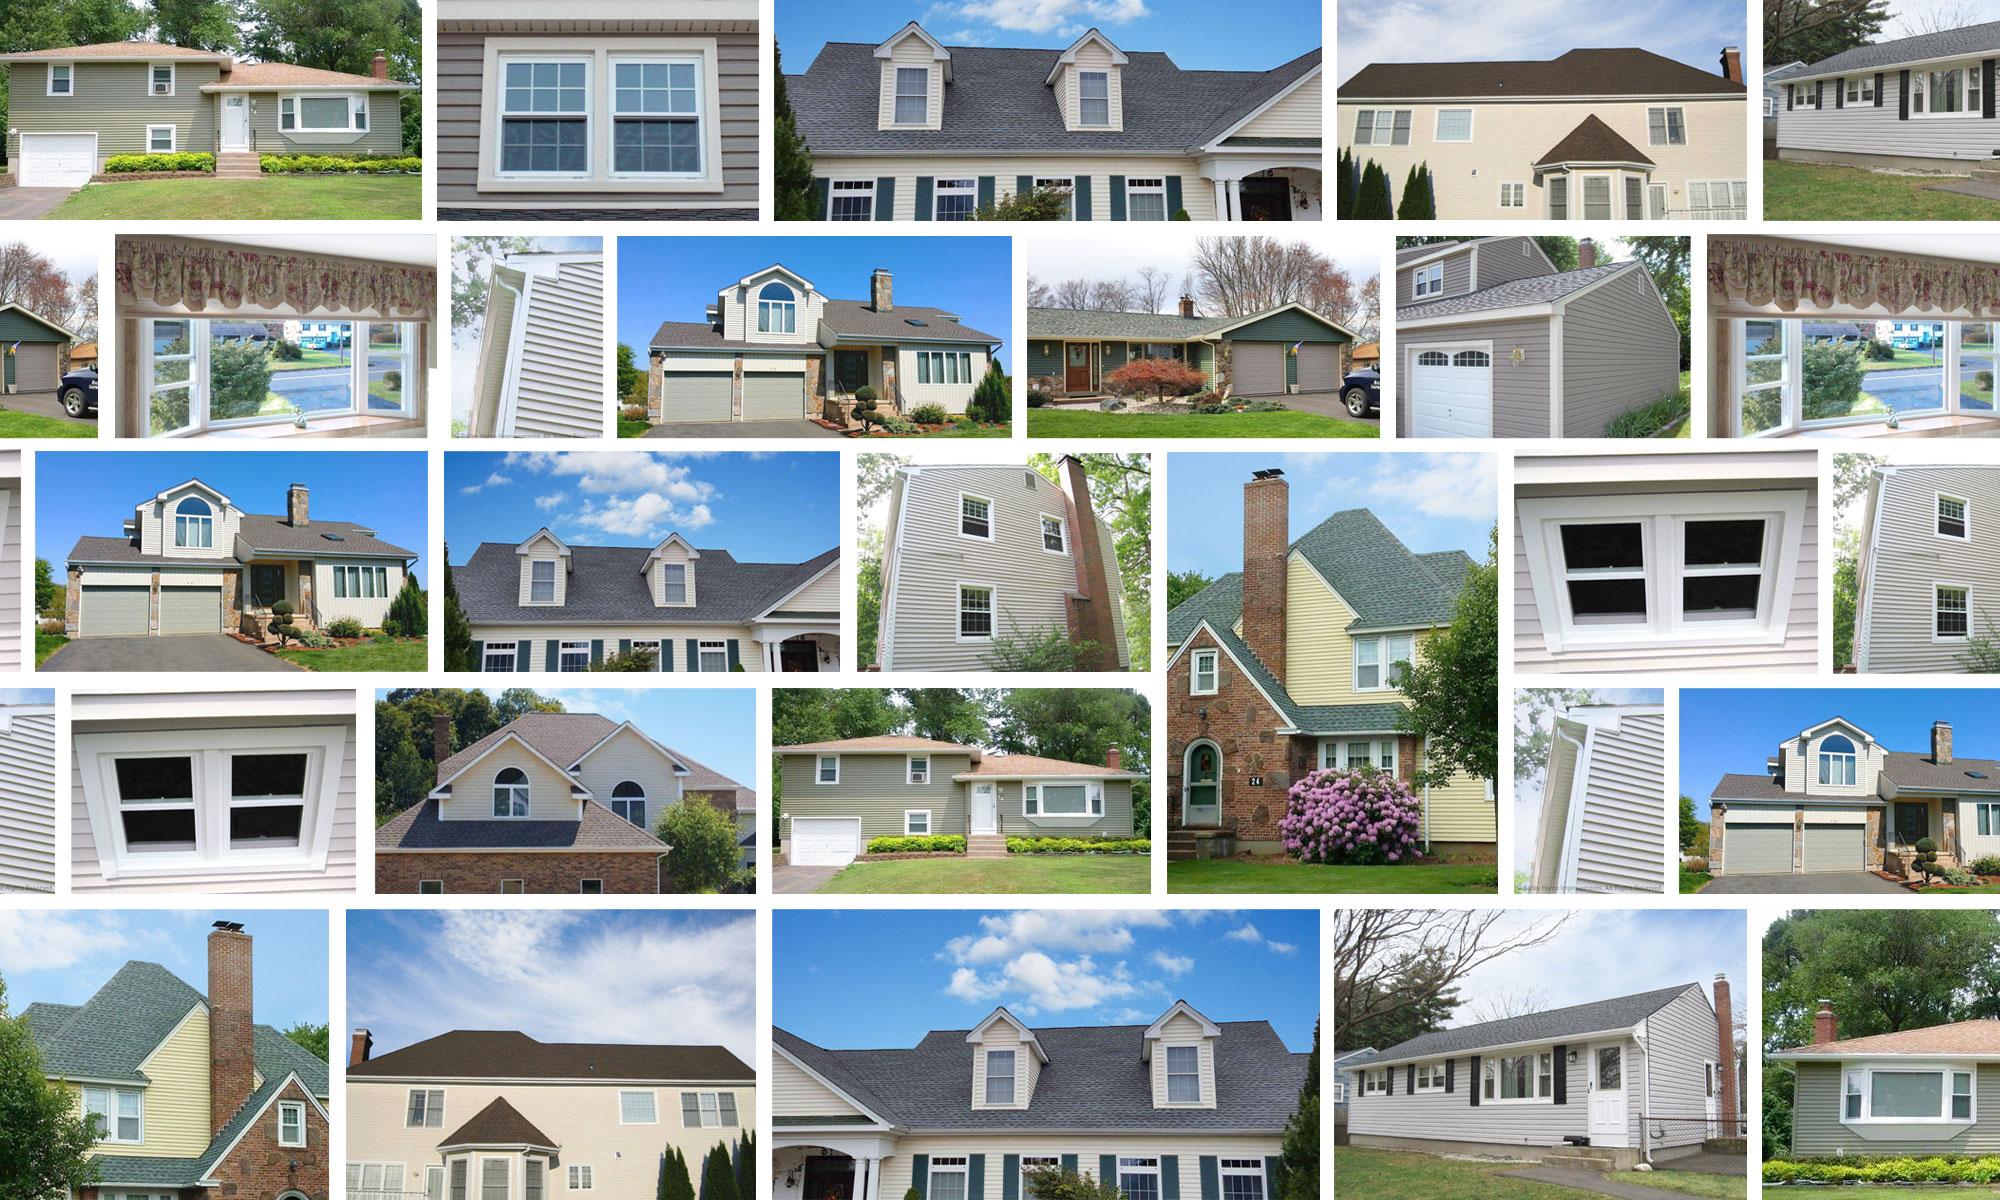 Bailey Home Improvements